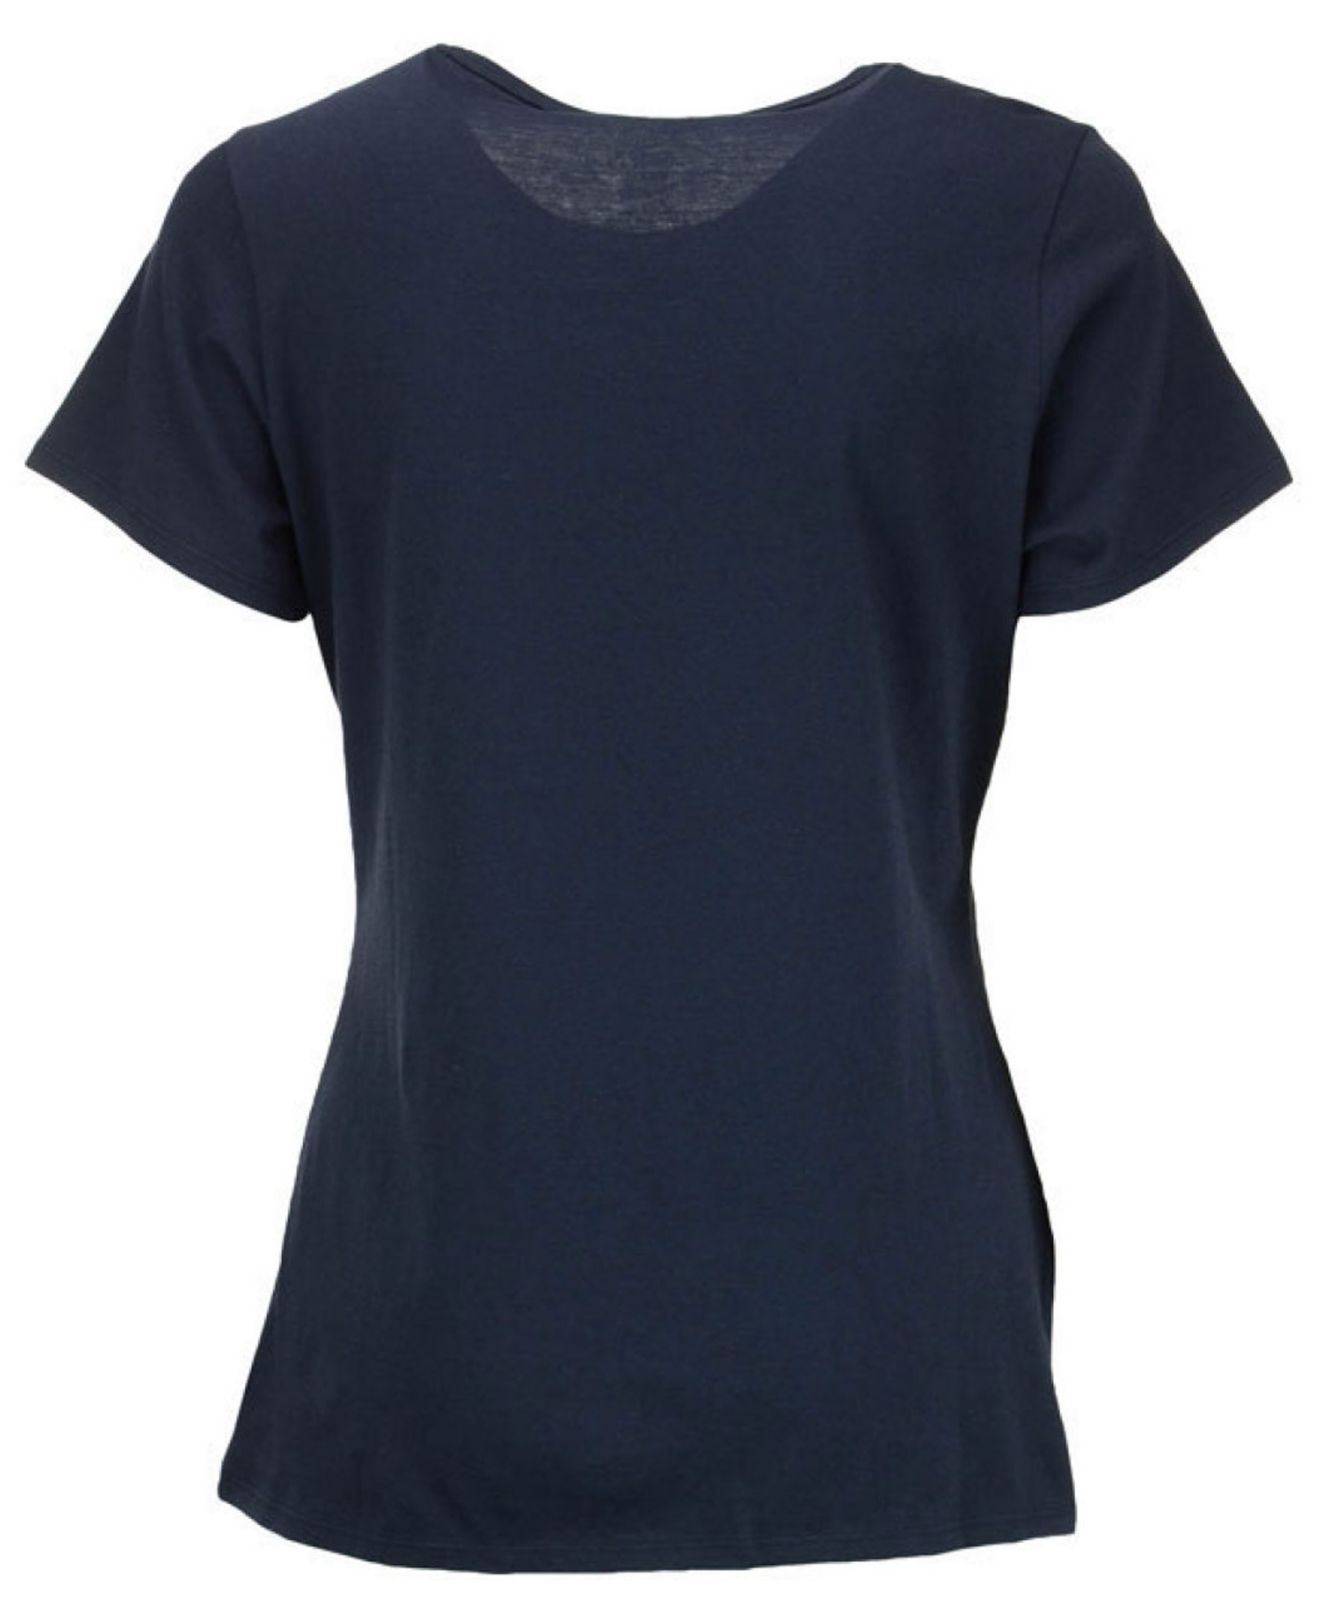 womens navy shirt custom shirt